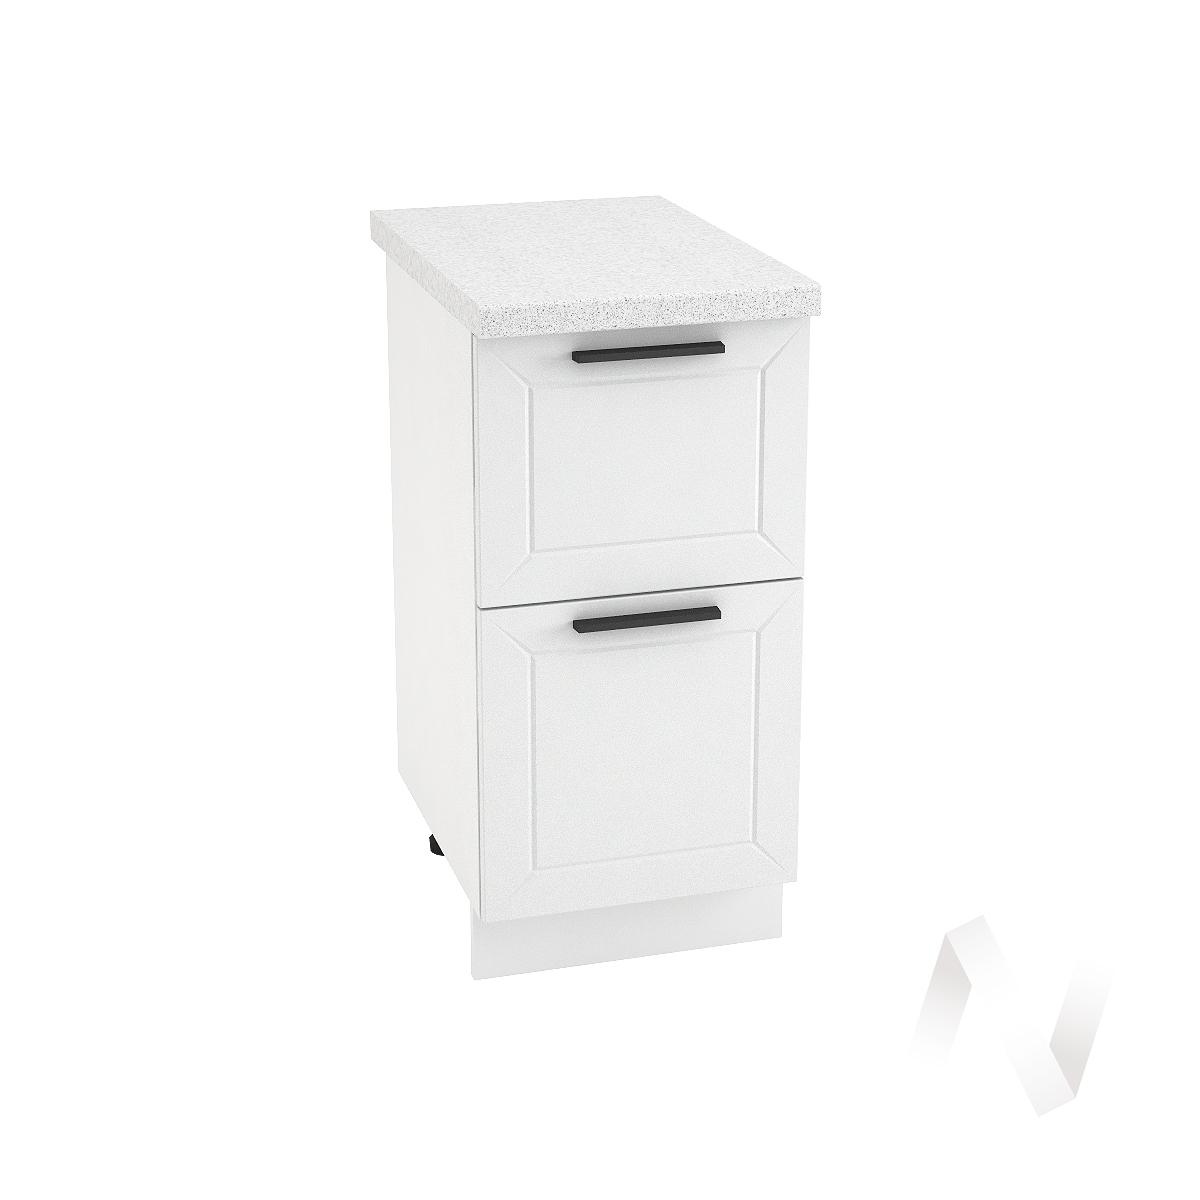 "Кухня ""Глетчер"": Шкаф нижний с 2-мя ящиками 400, ШН2Я 400 (Айленд Силк/корпус белый)"